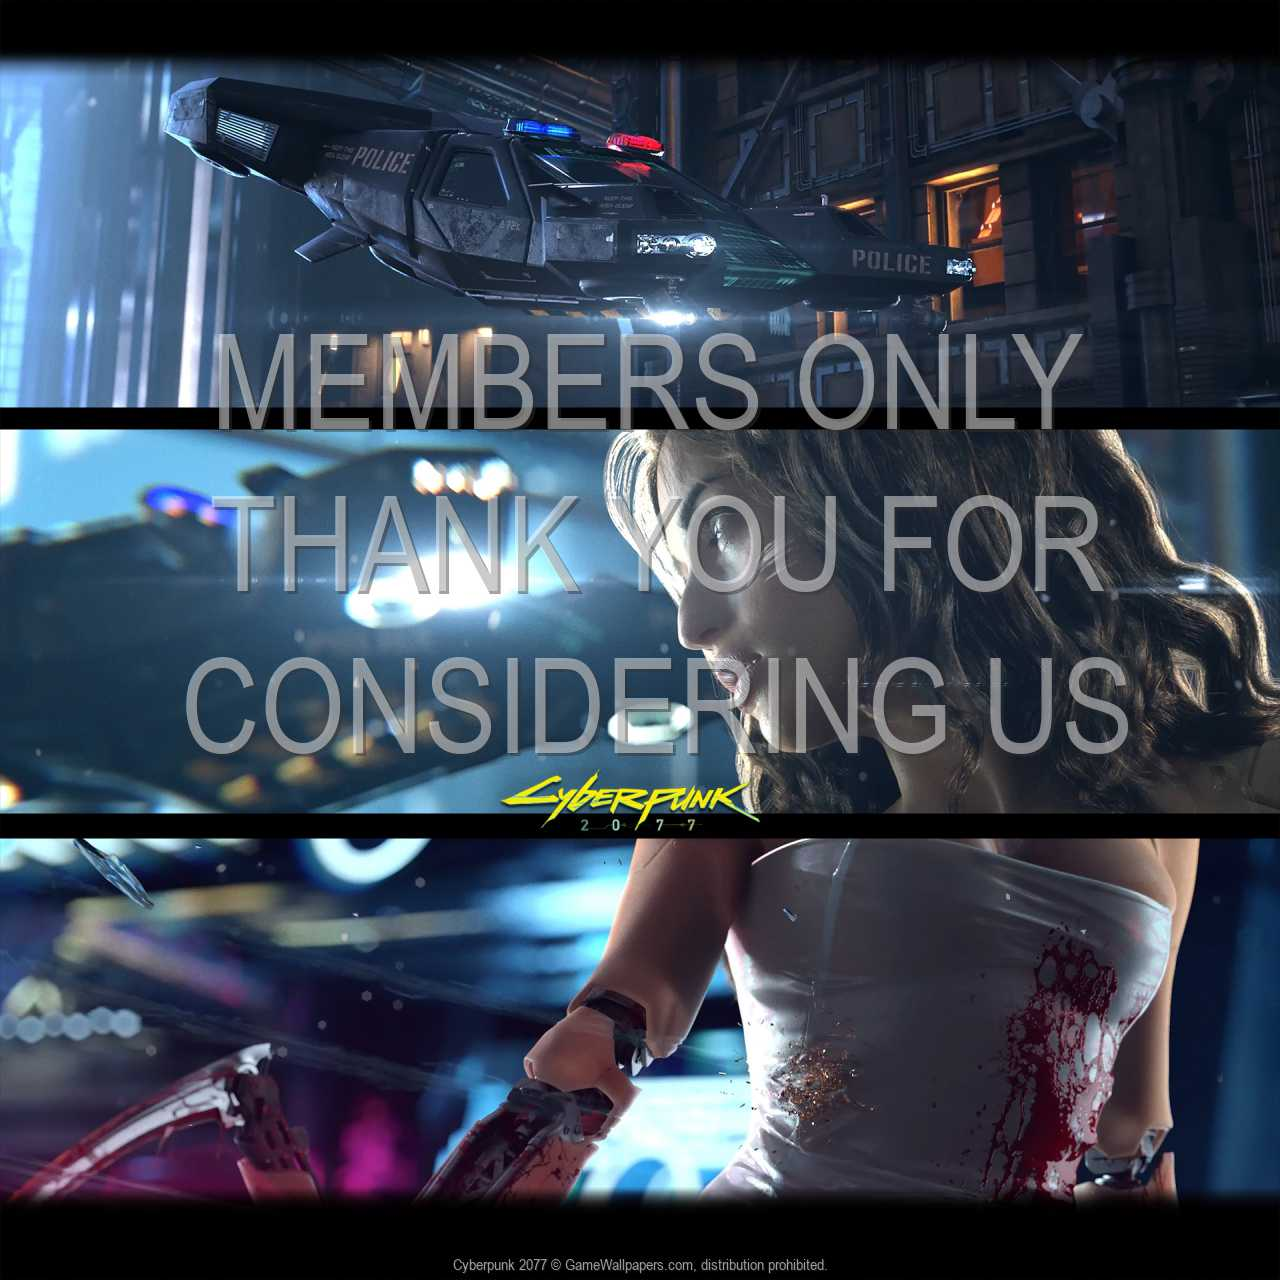 Cyberpunk 2077 720p Horizontal Mobile fond d'écran 03